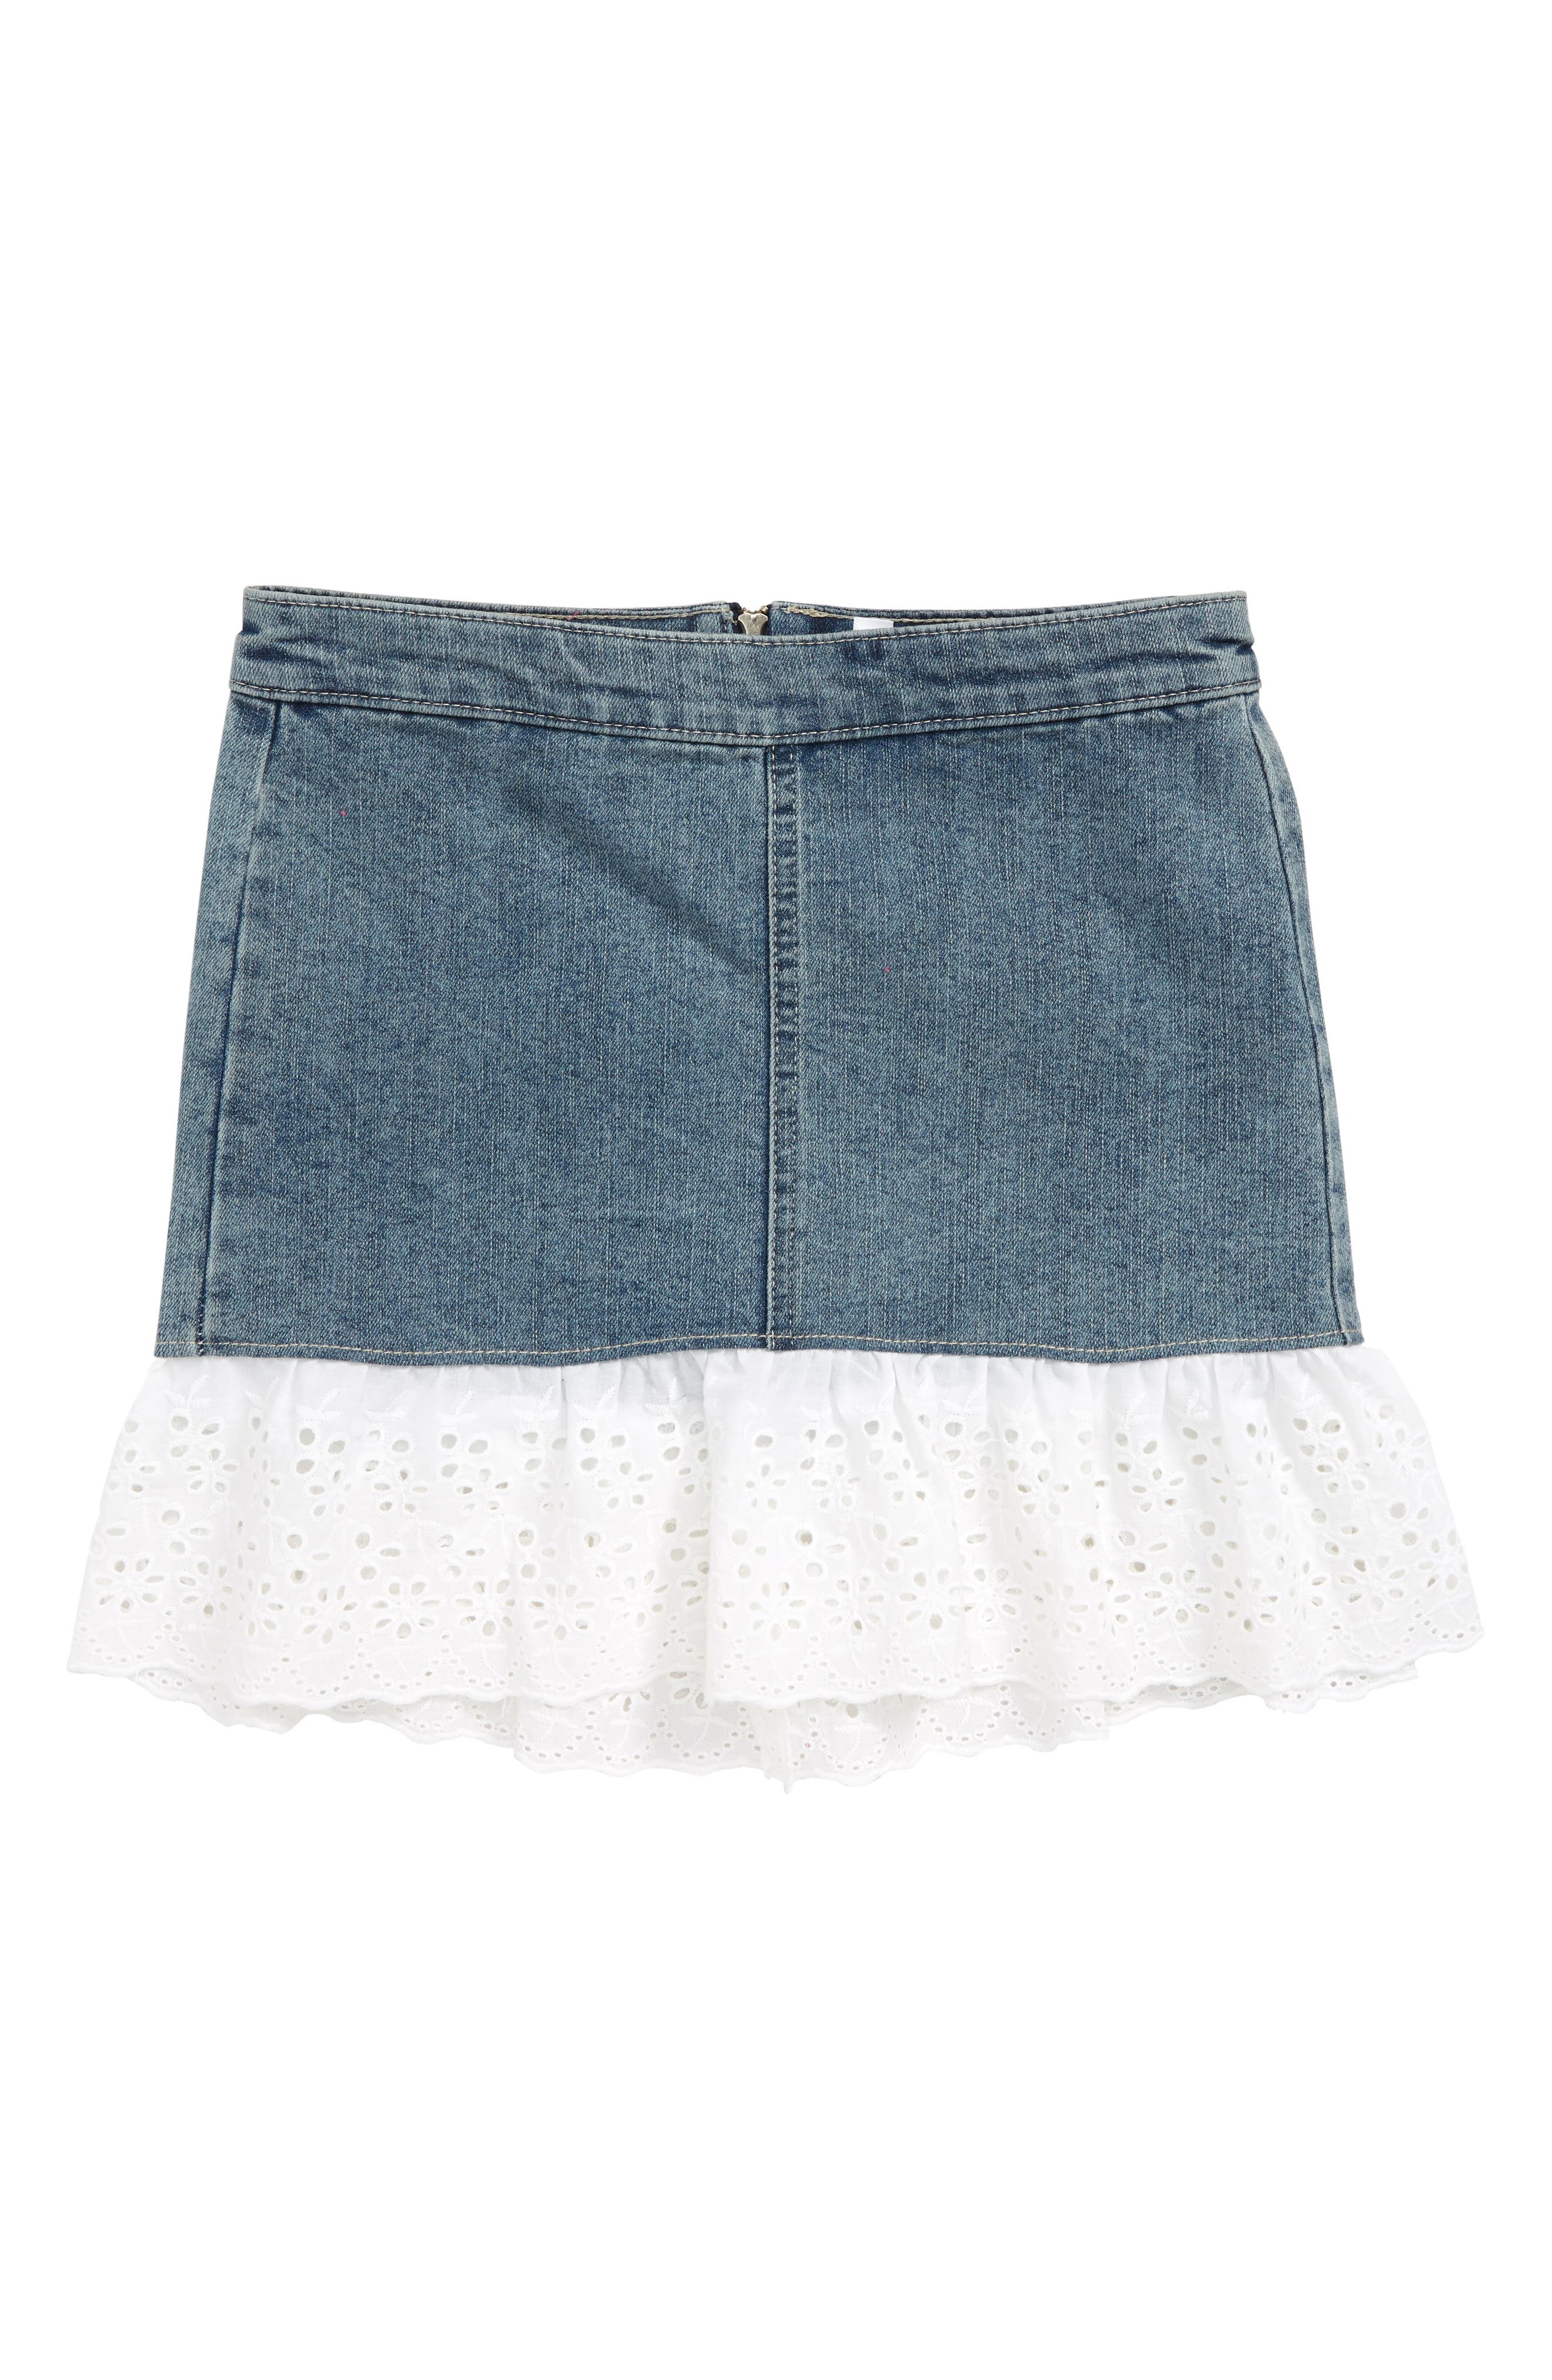 Denim Skirt,                             Main thumbnail 1, color,                             400